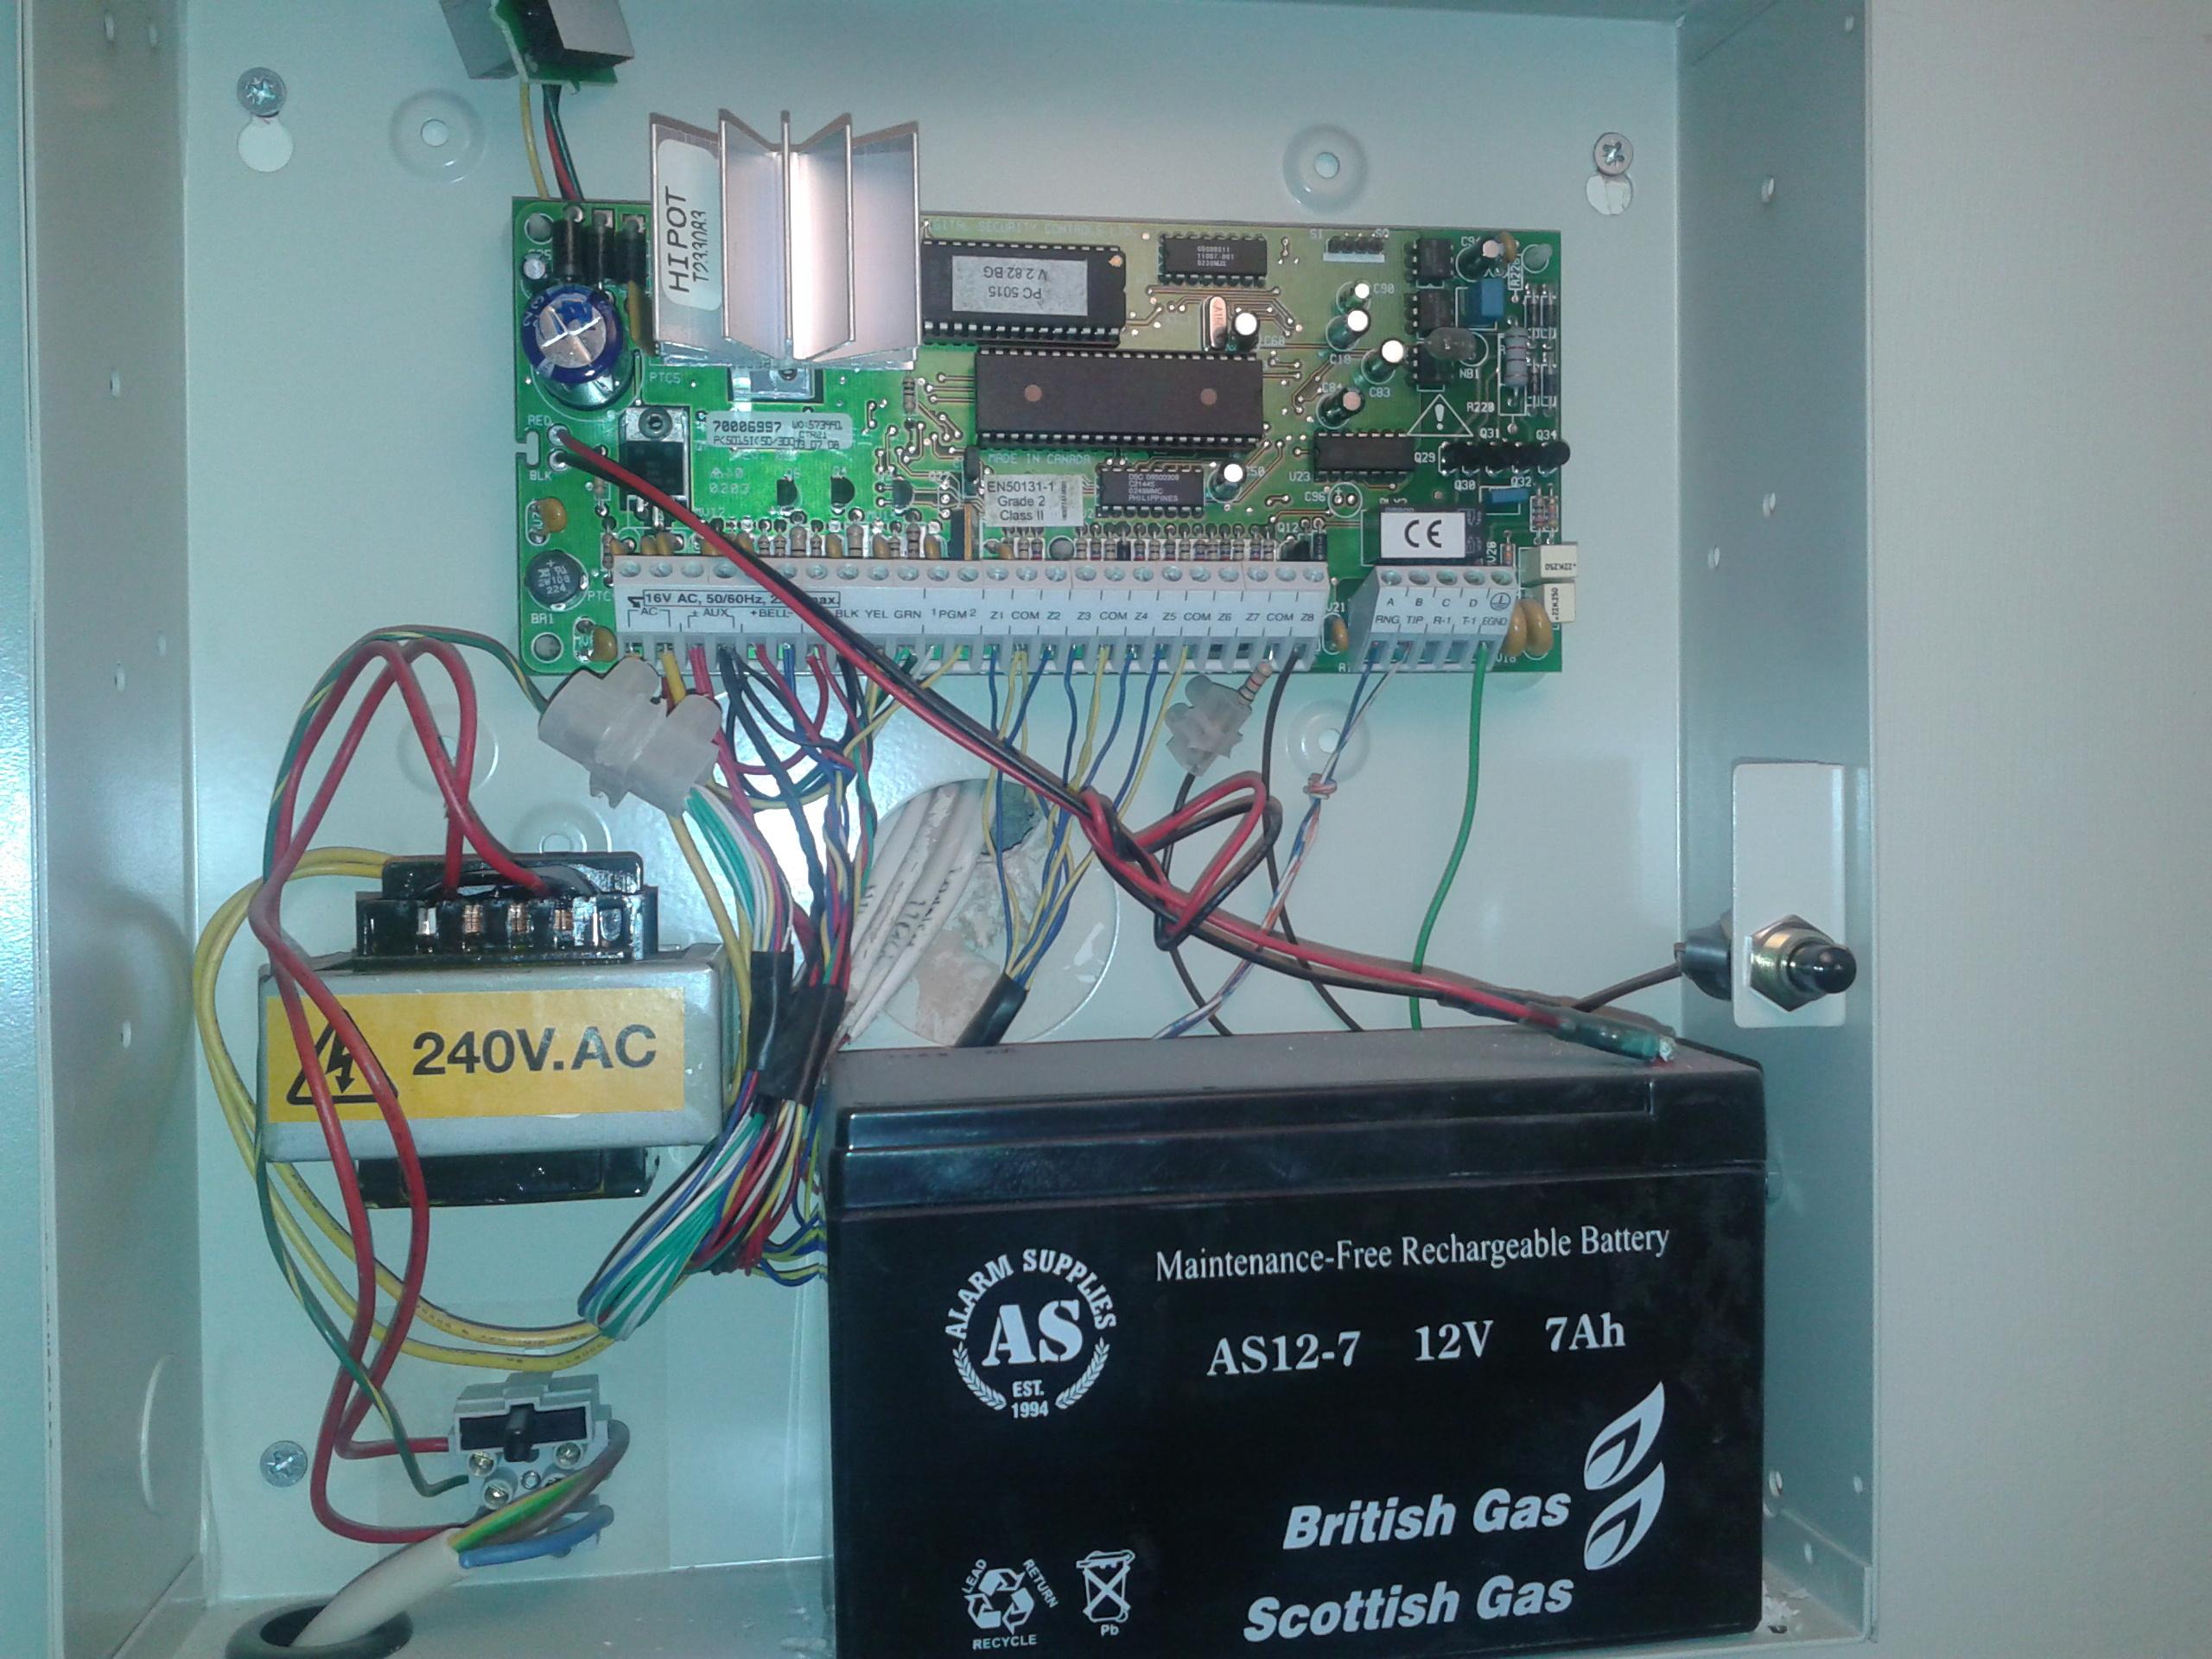 British gas House alarm Manual